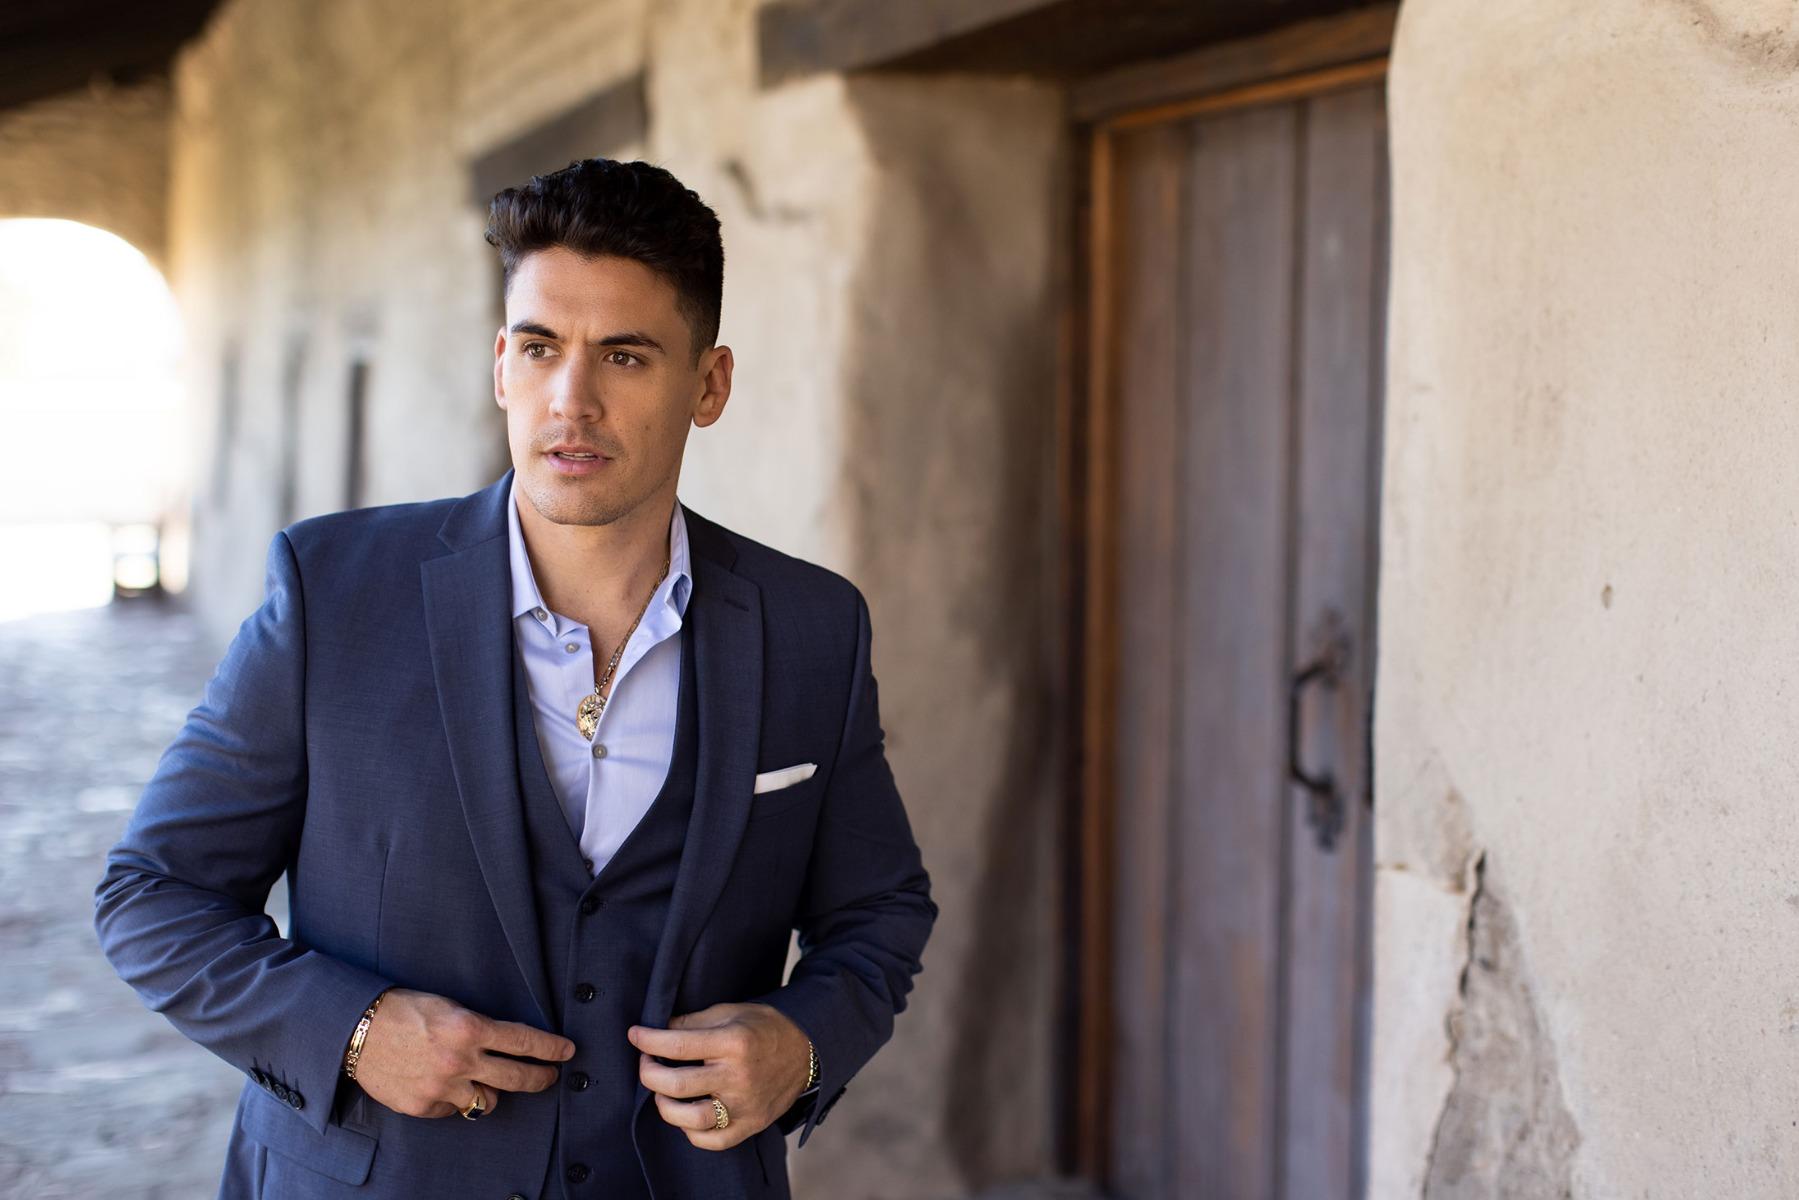 Stylish man in suit.